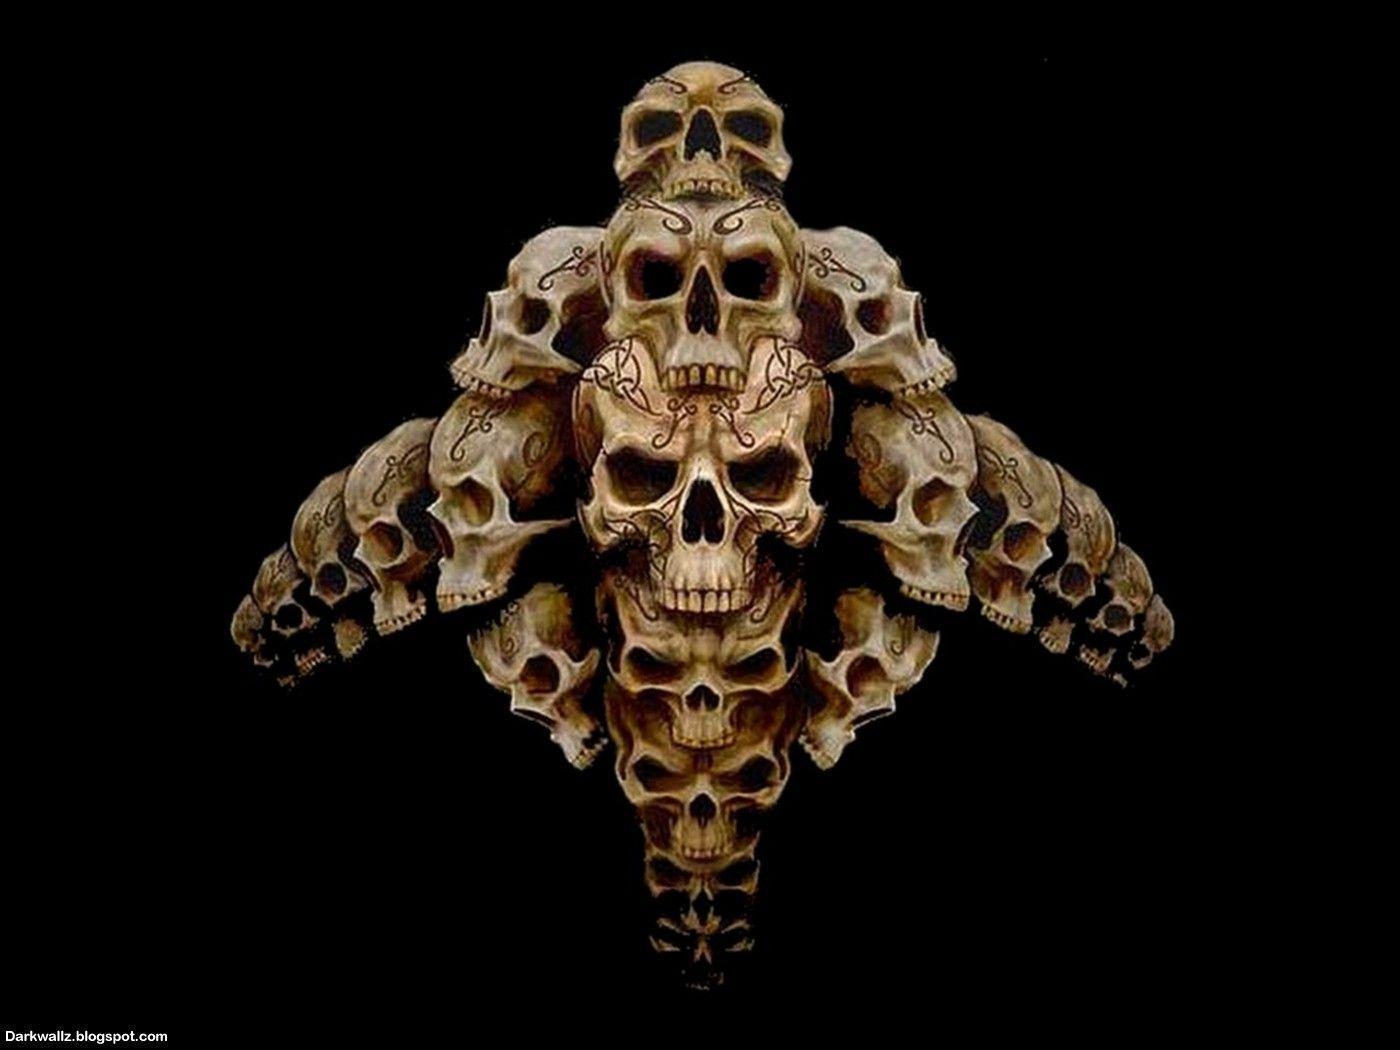 Skull Wallpapers Image - Wallpaper Cave